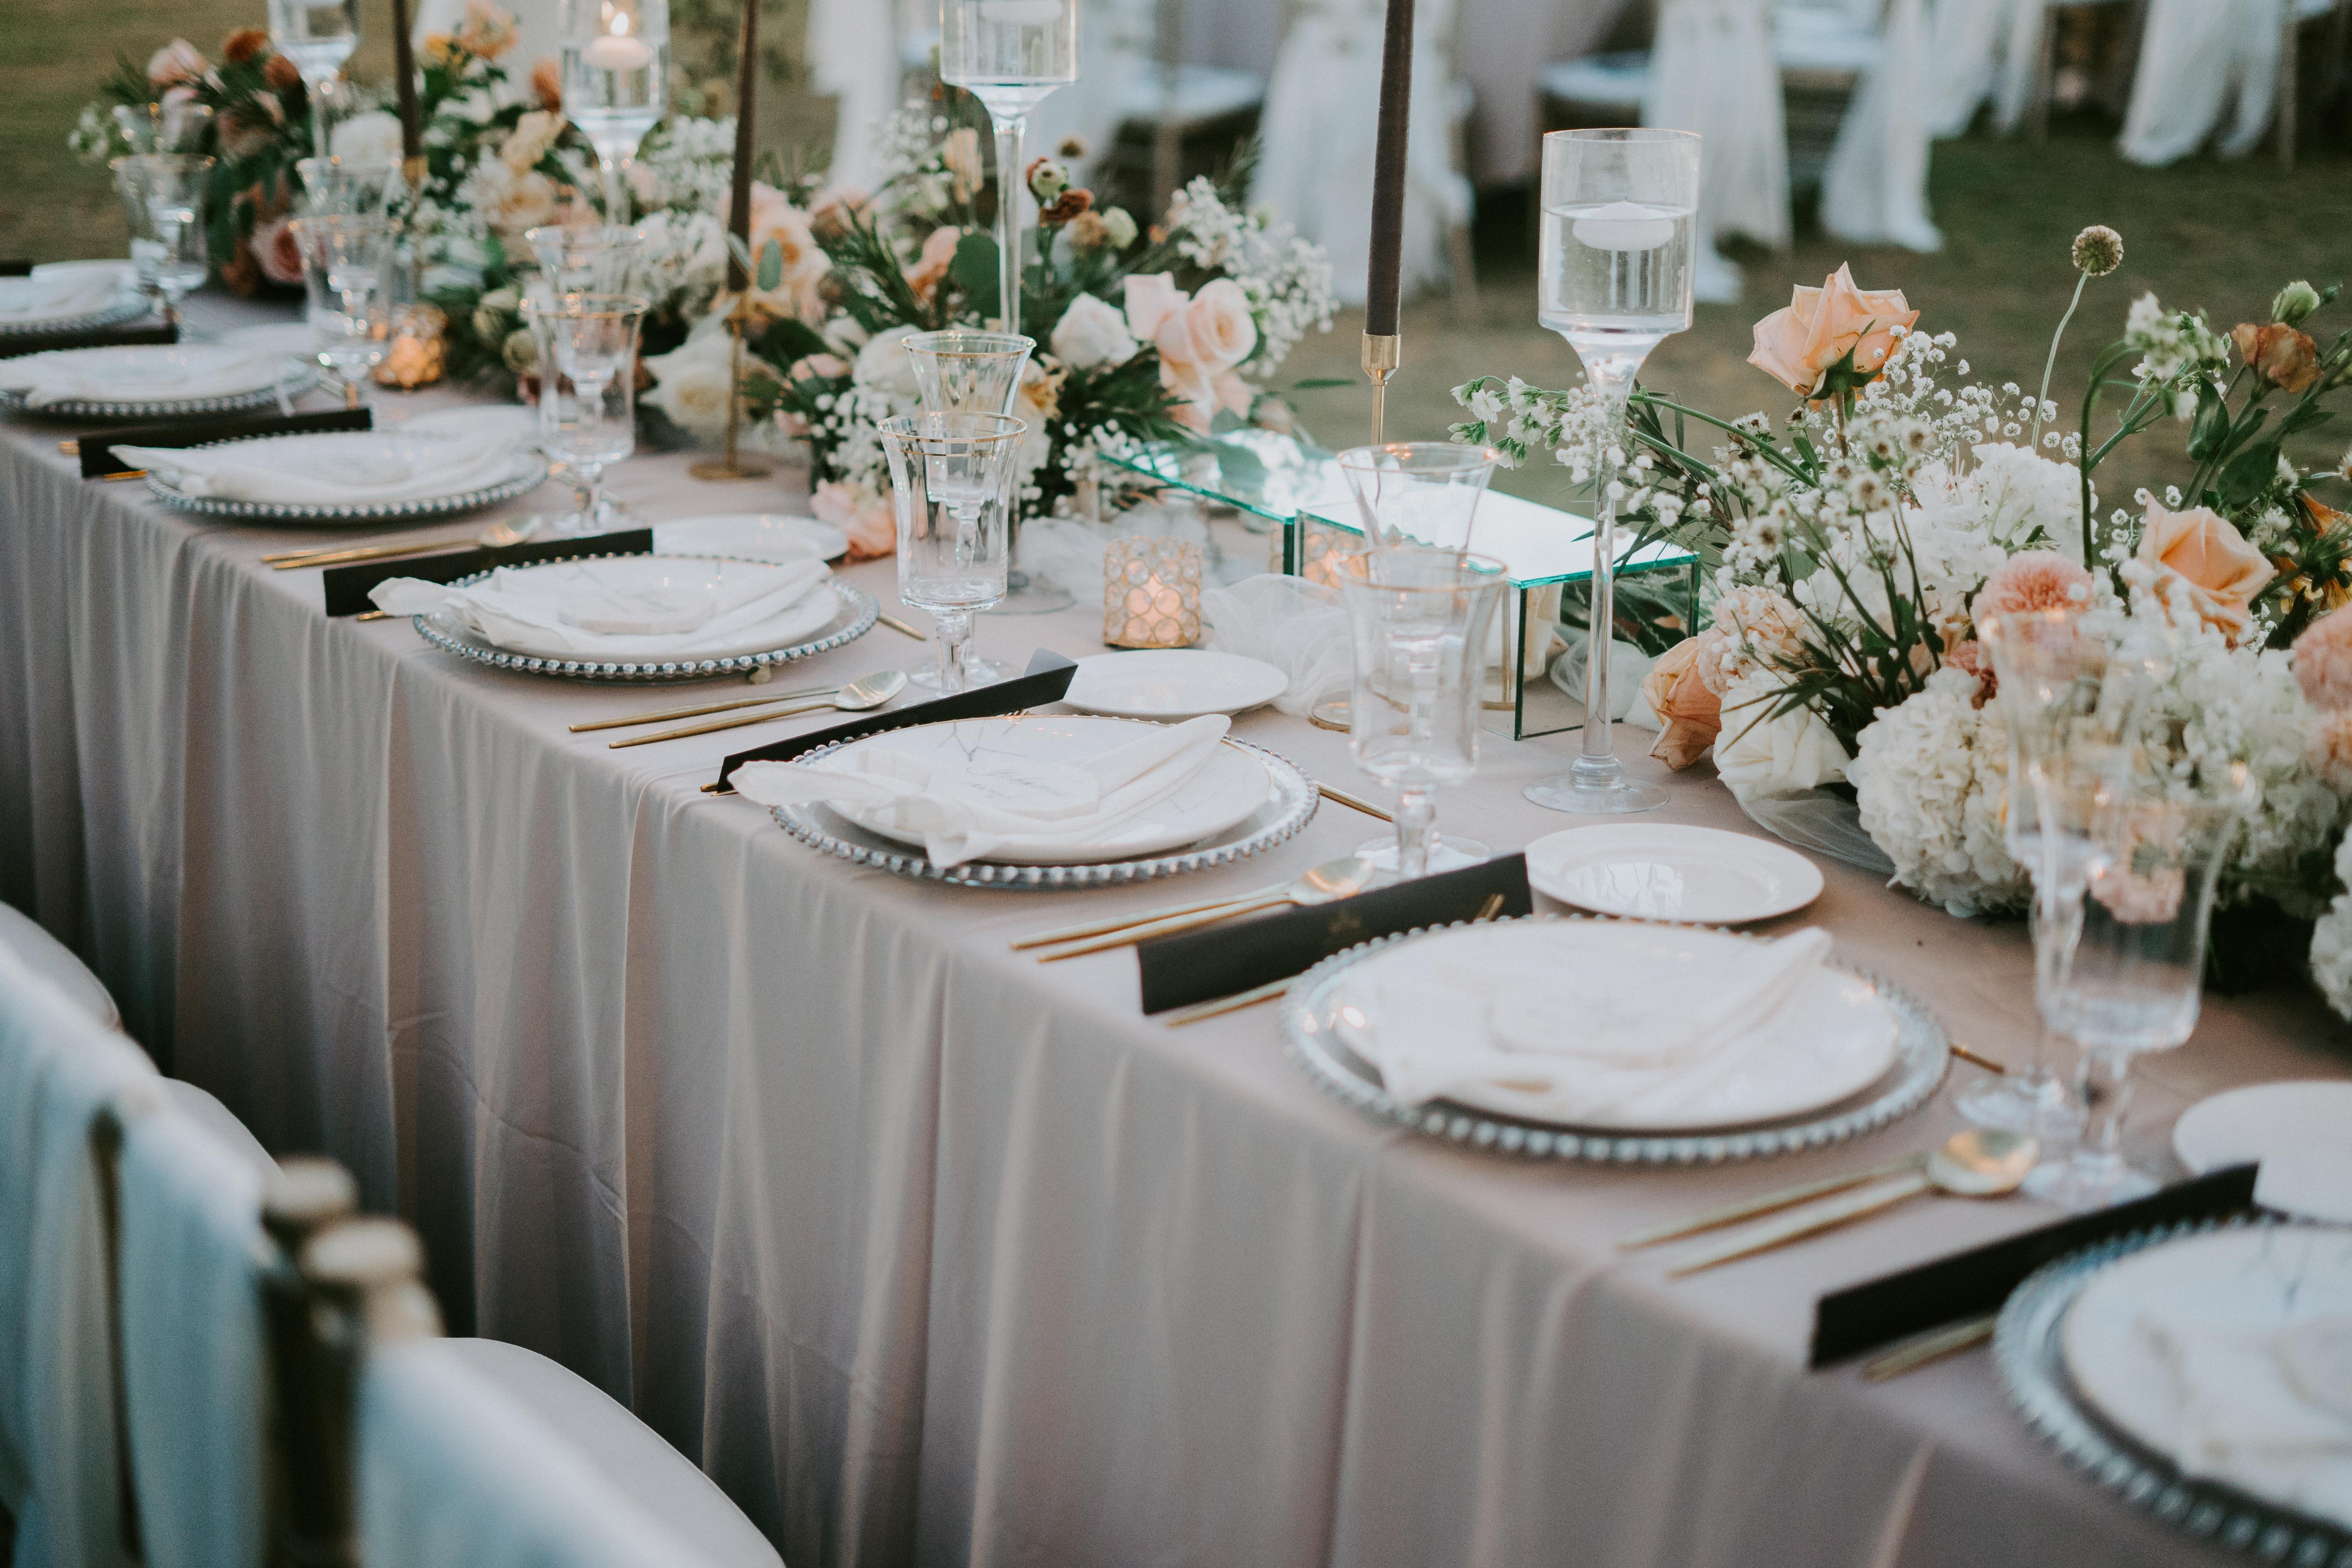 decorated-table-setting-for-wedding-celebration.jpg